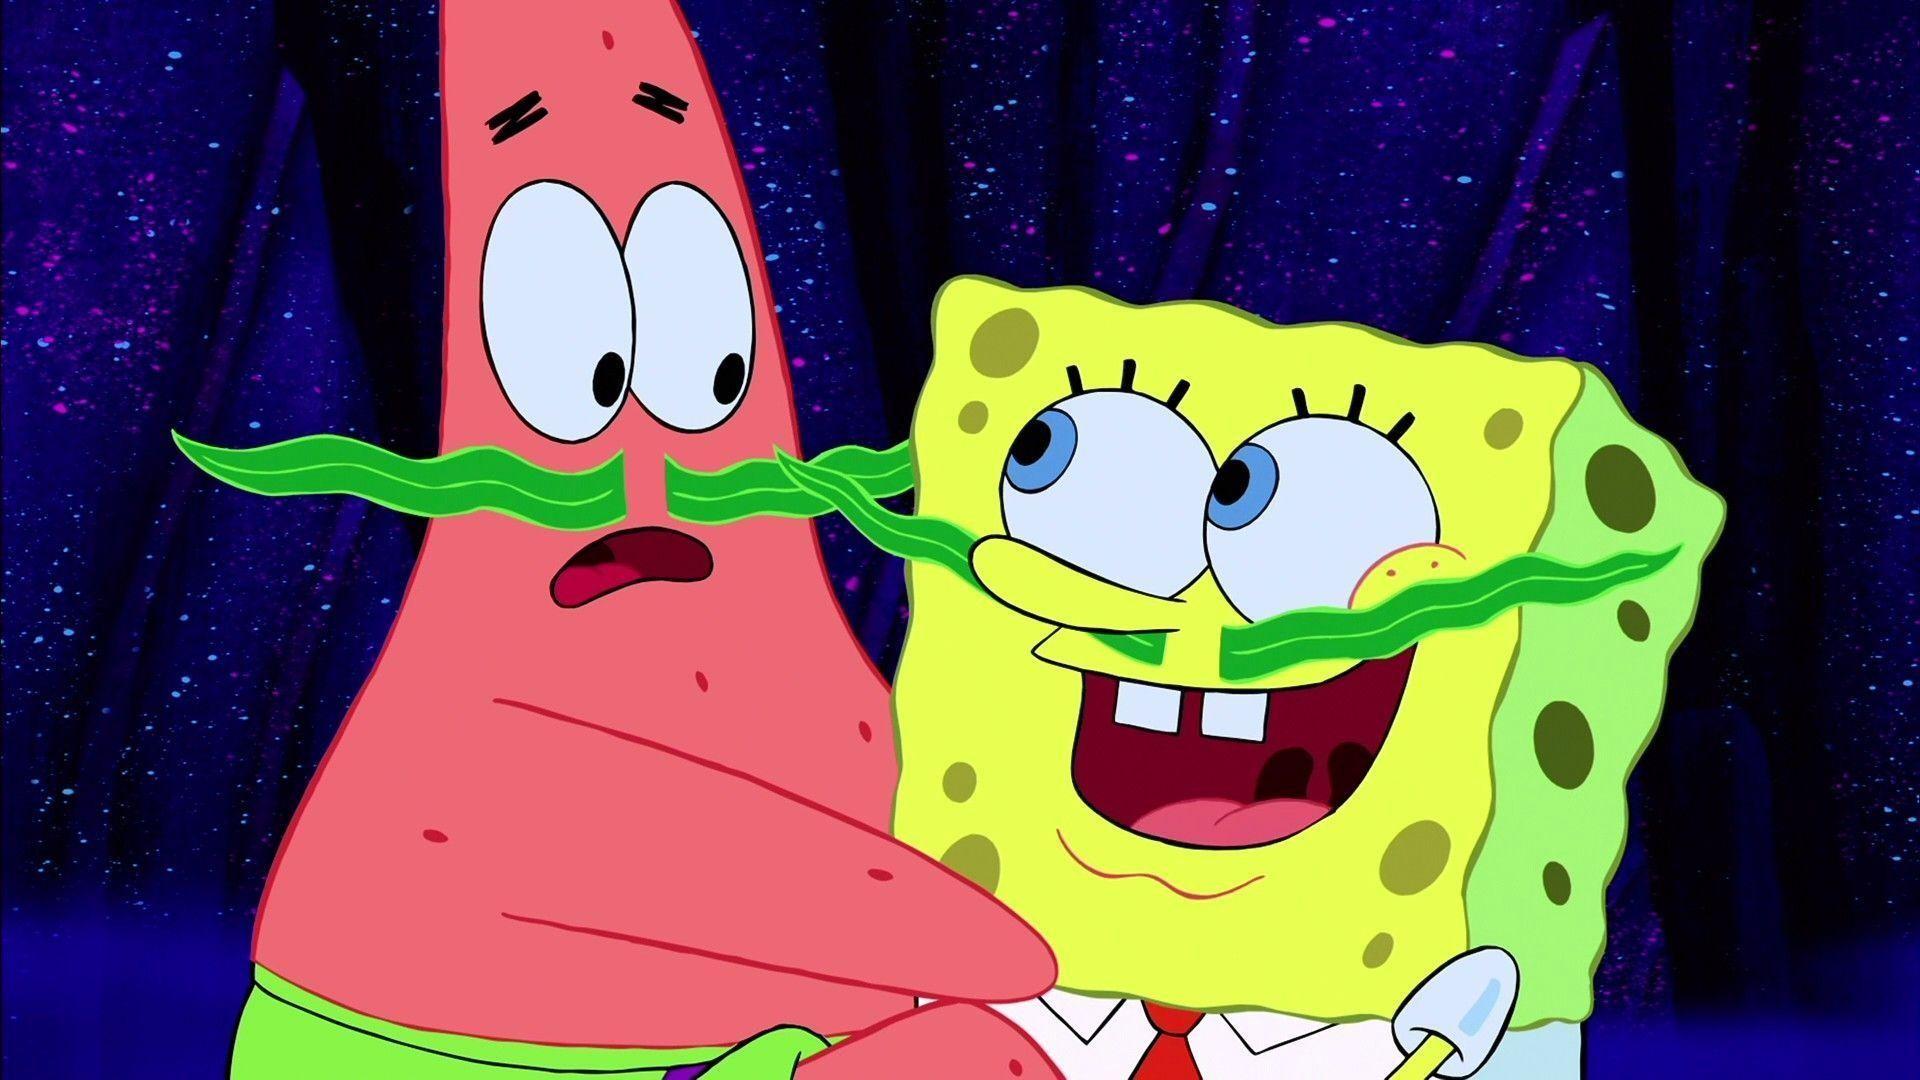 Funny Spongebob Wallpaper Free – ToObjects.